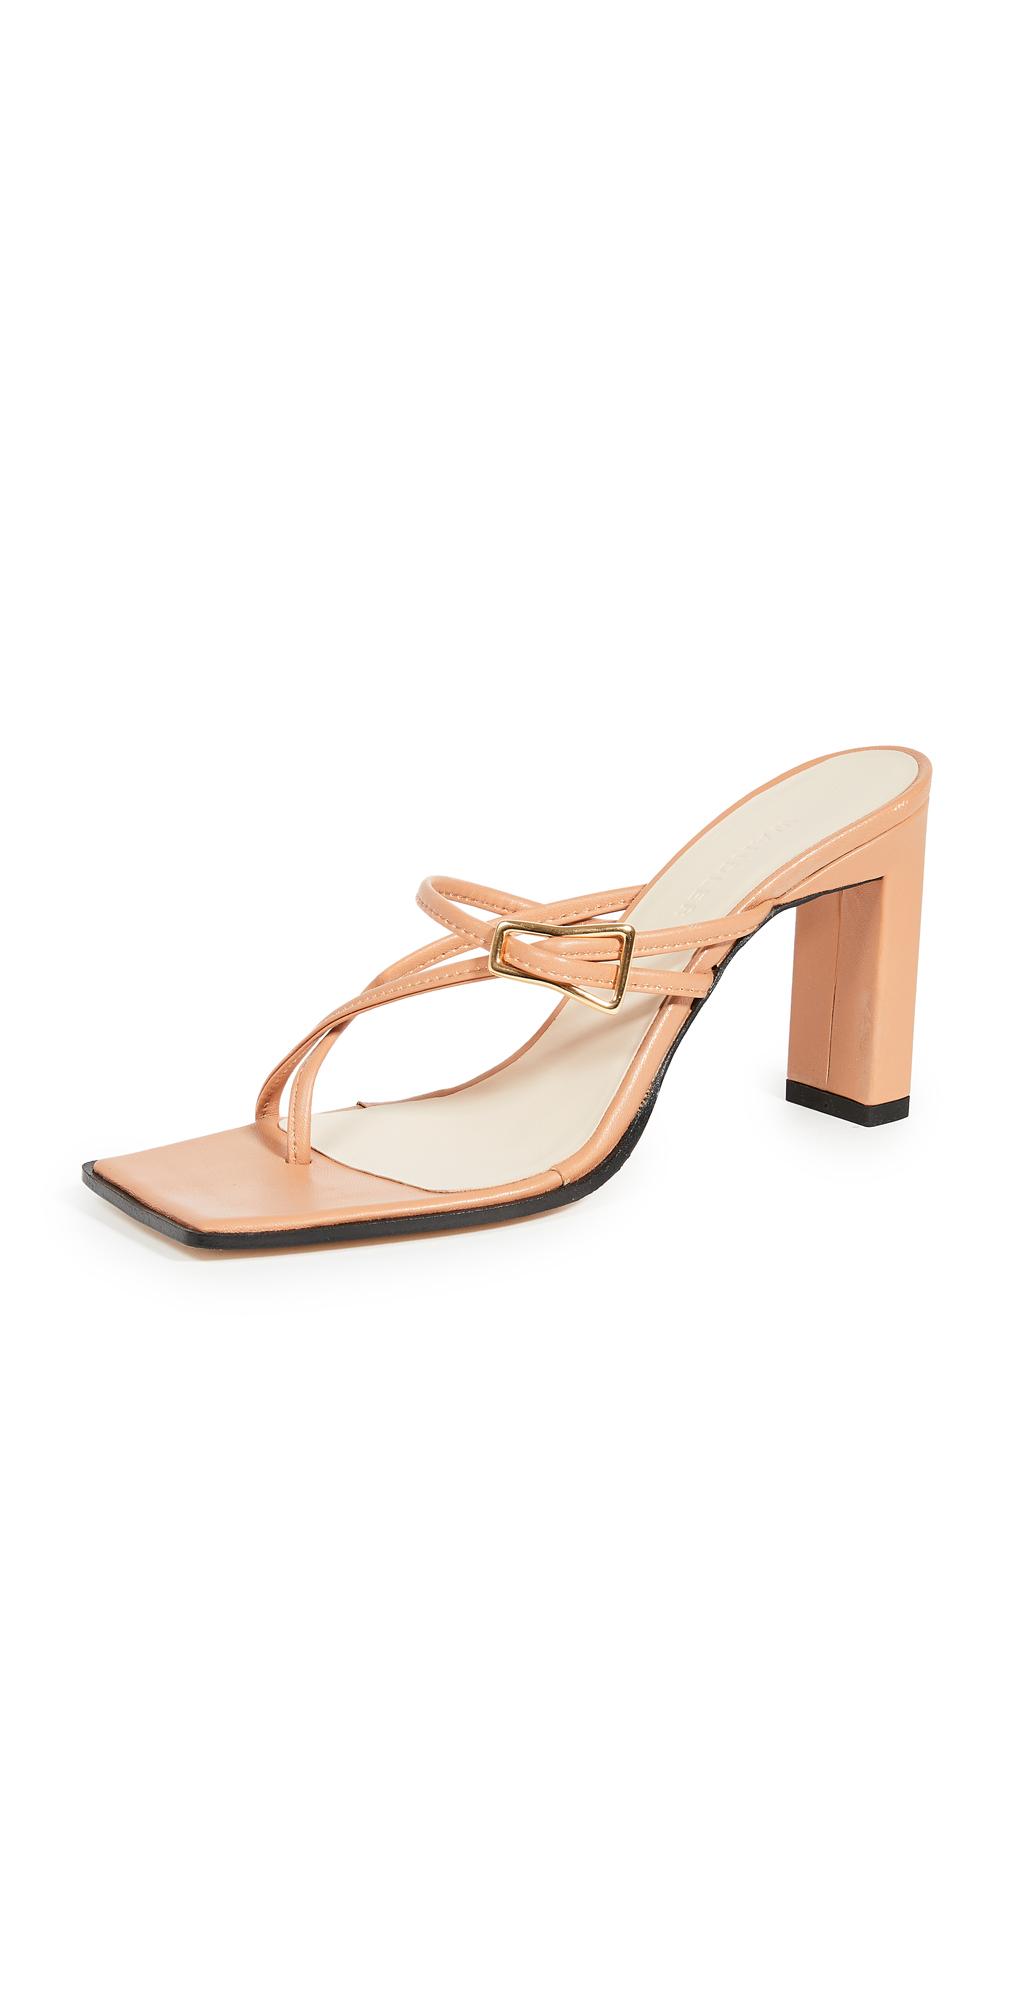 Wandler Yara Sandals